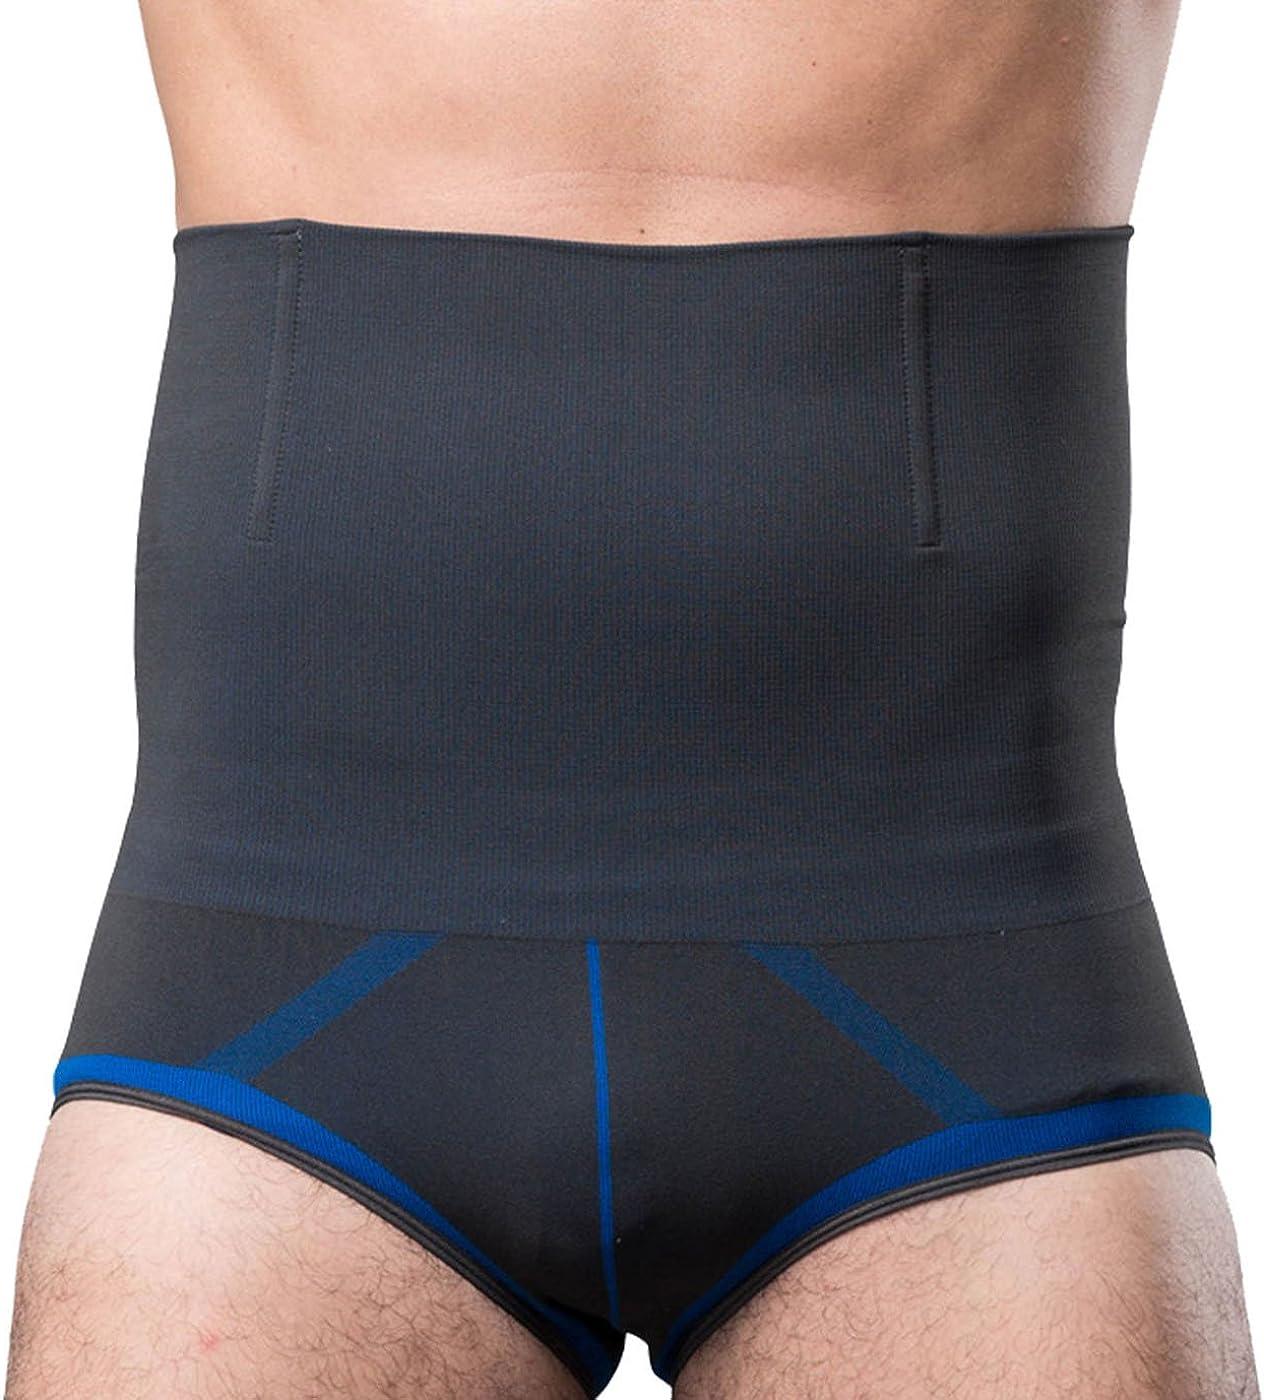 FEOYA - Calzoncillos Slip Moldeador con Cintura Alta para Hombre Ropa Interior Reductora Faja Moldeadora Reductora Adelgazante Cinturón Adelgazante Abdominal